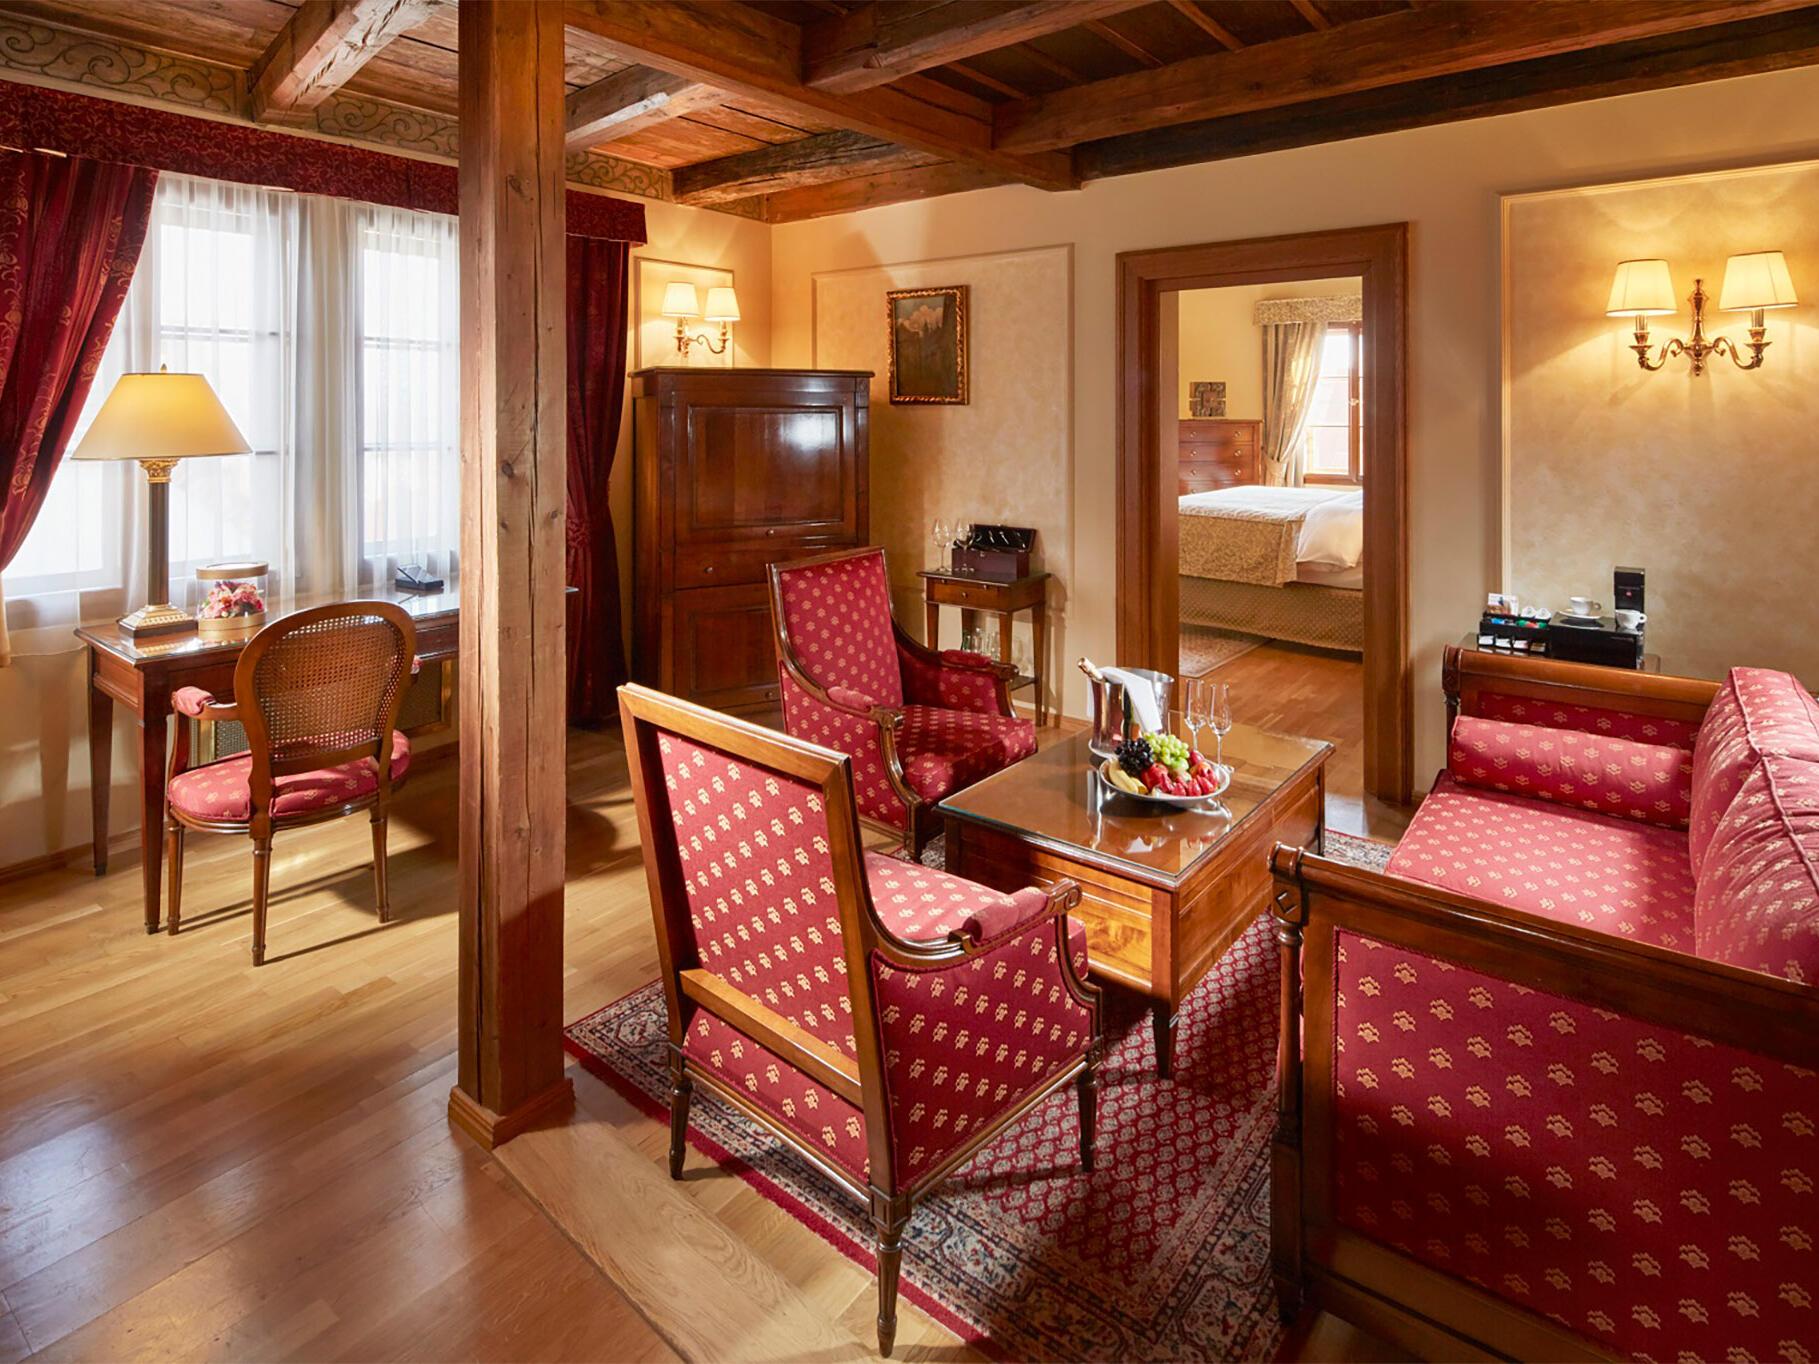 Tycho de Brahe Suite at Golden Well Hotel in Prague